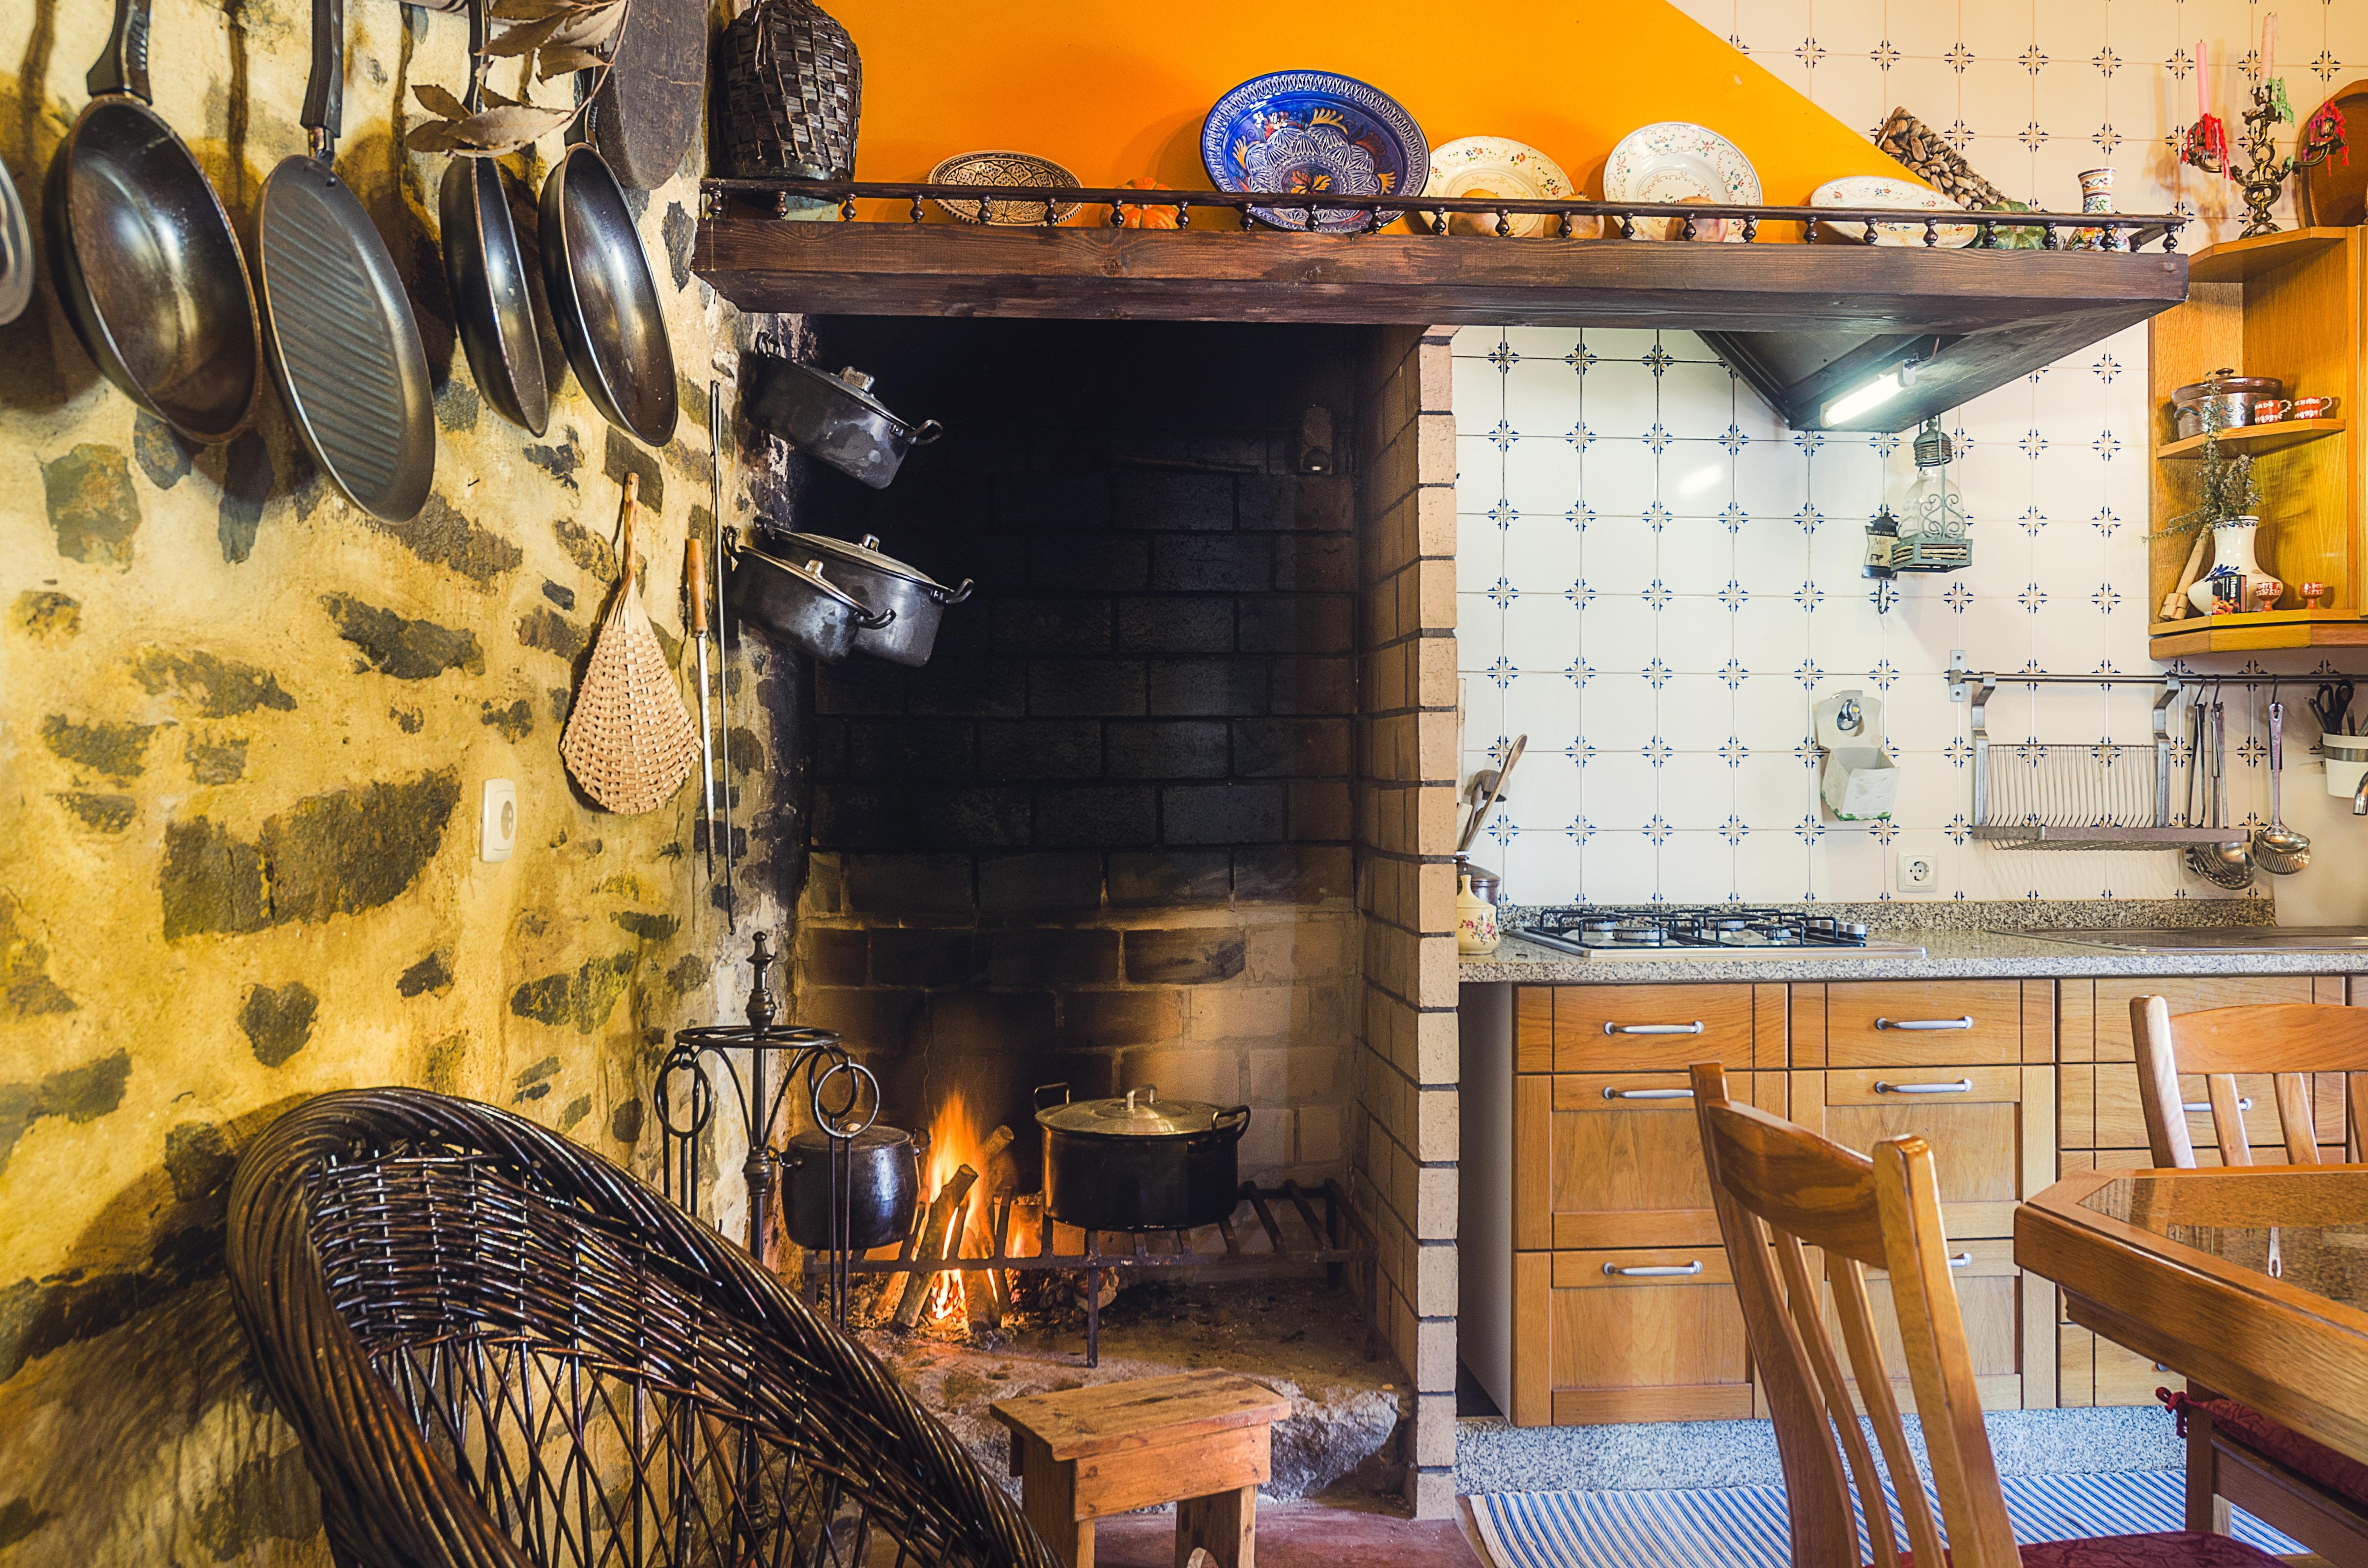 Kostenlose foto : Landschaft, Berg, Restaurant, Zuhause, rustikal ...